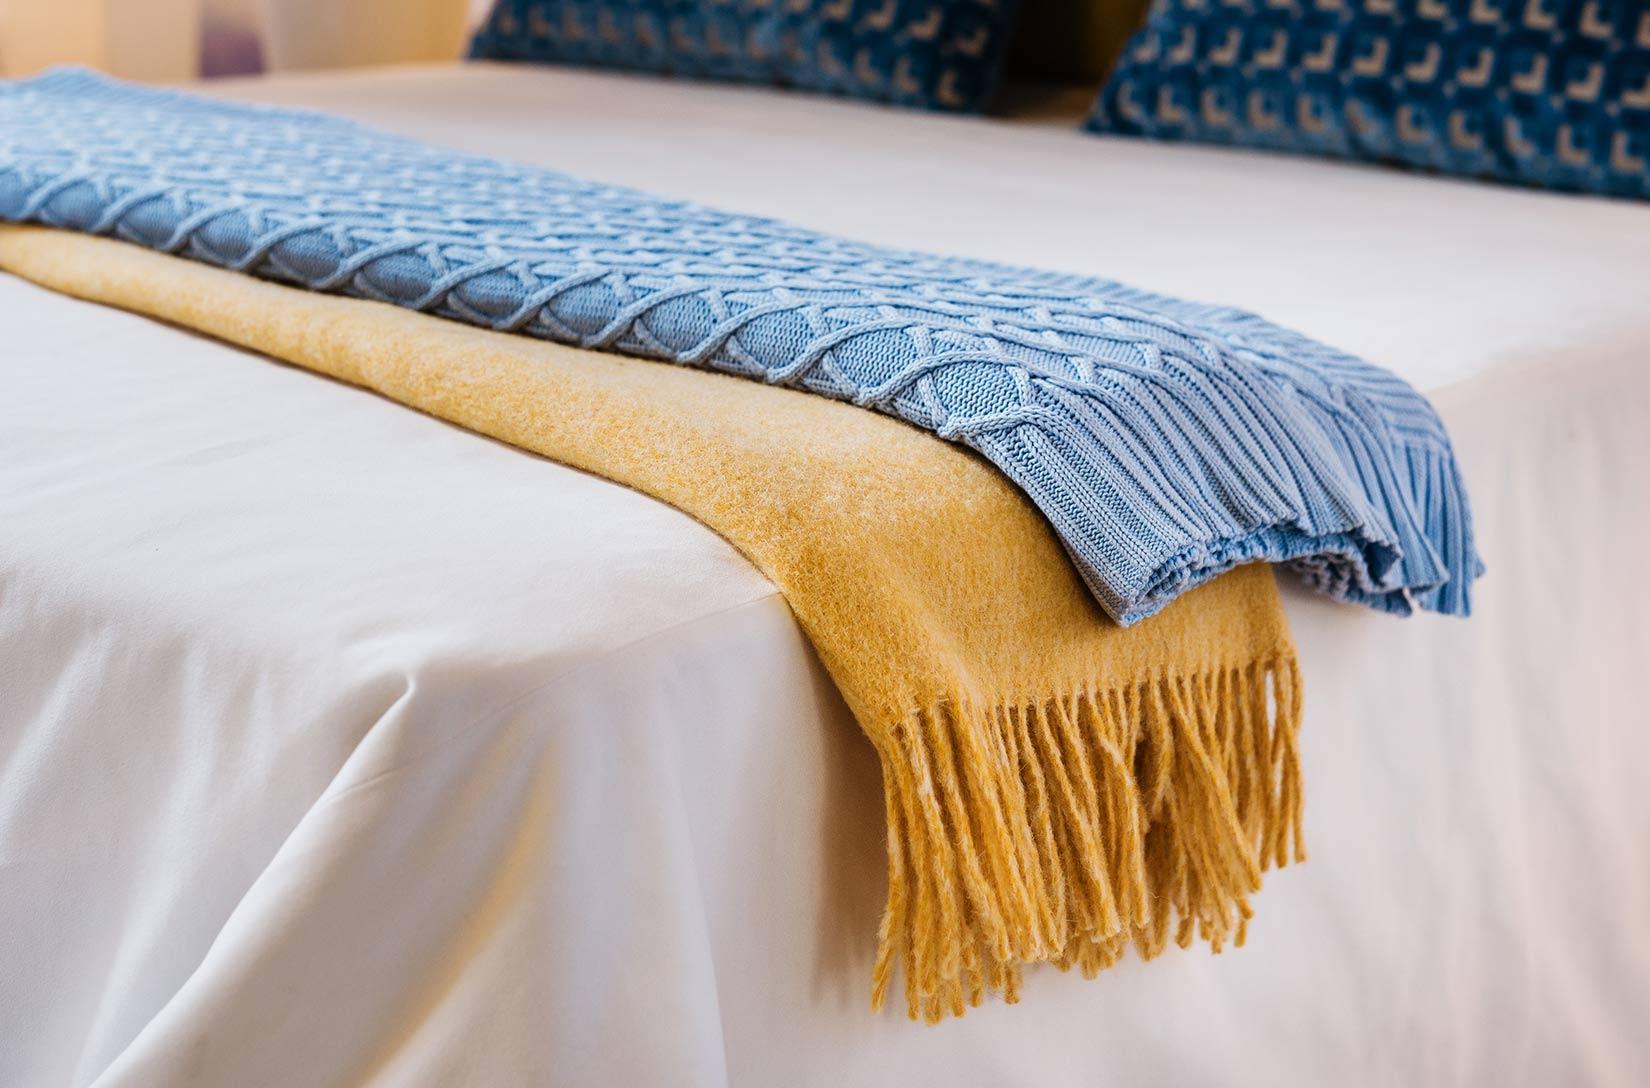 6.mantas-cama-slide